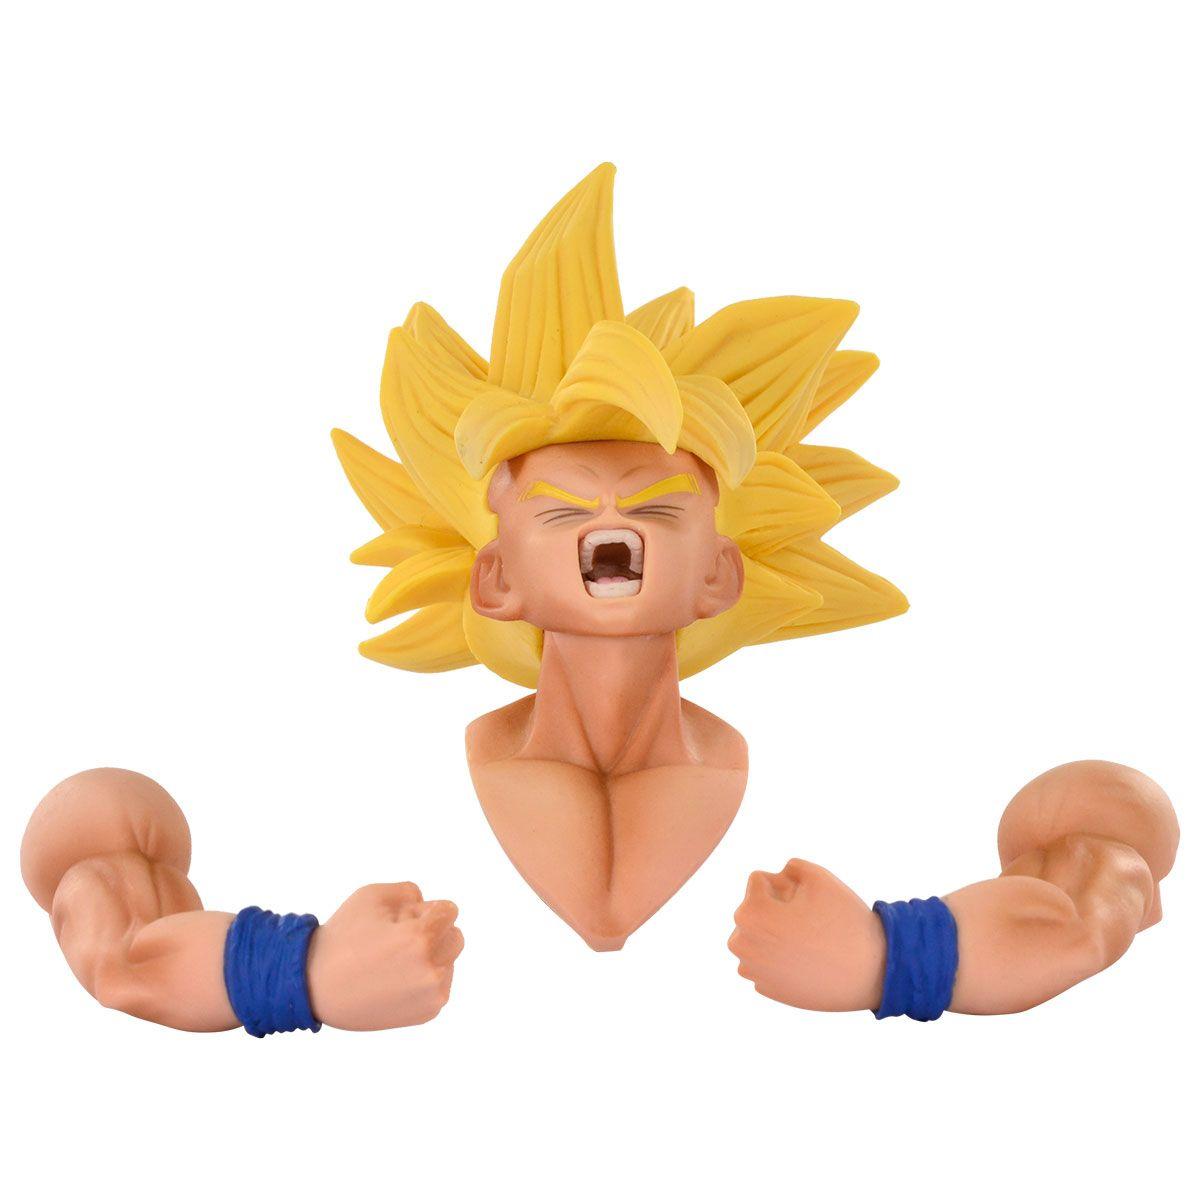 Estátua Gohan Super Saiyajin Legend Battle: Dragon Ball Super Masterlise Emoving Anime Mangá - Banpresto Bandai